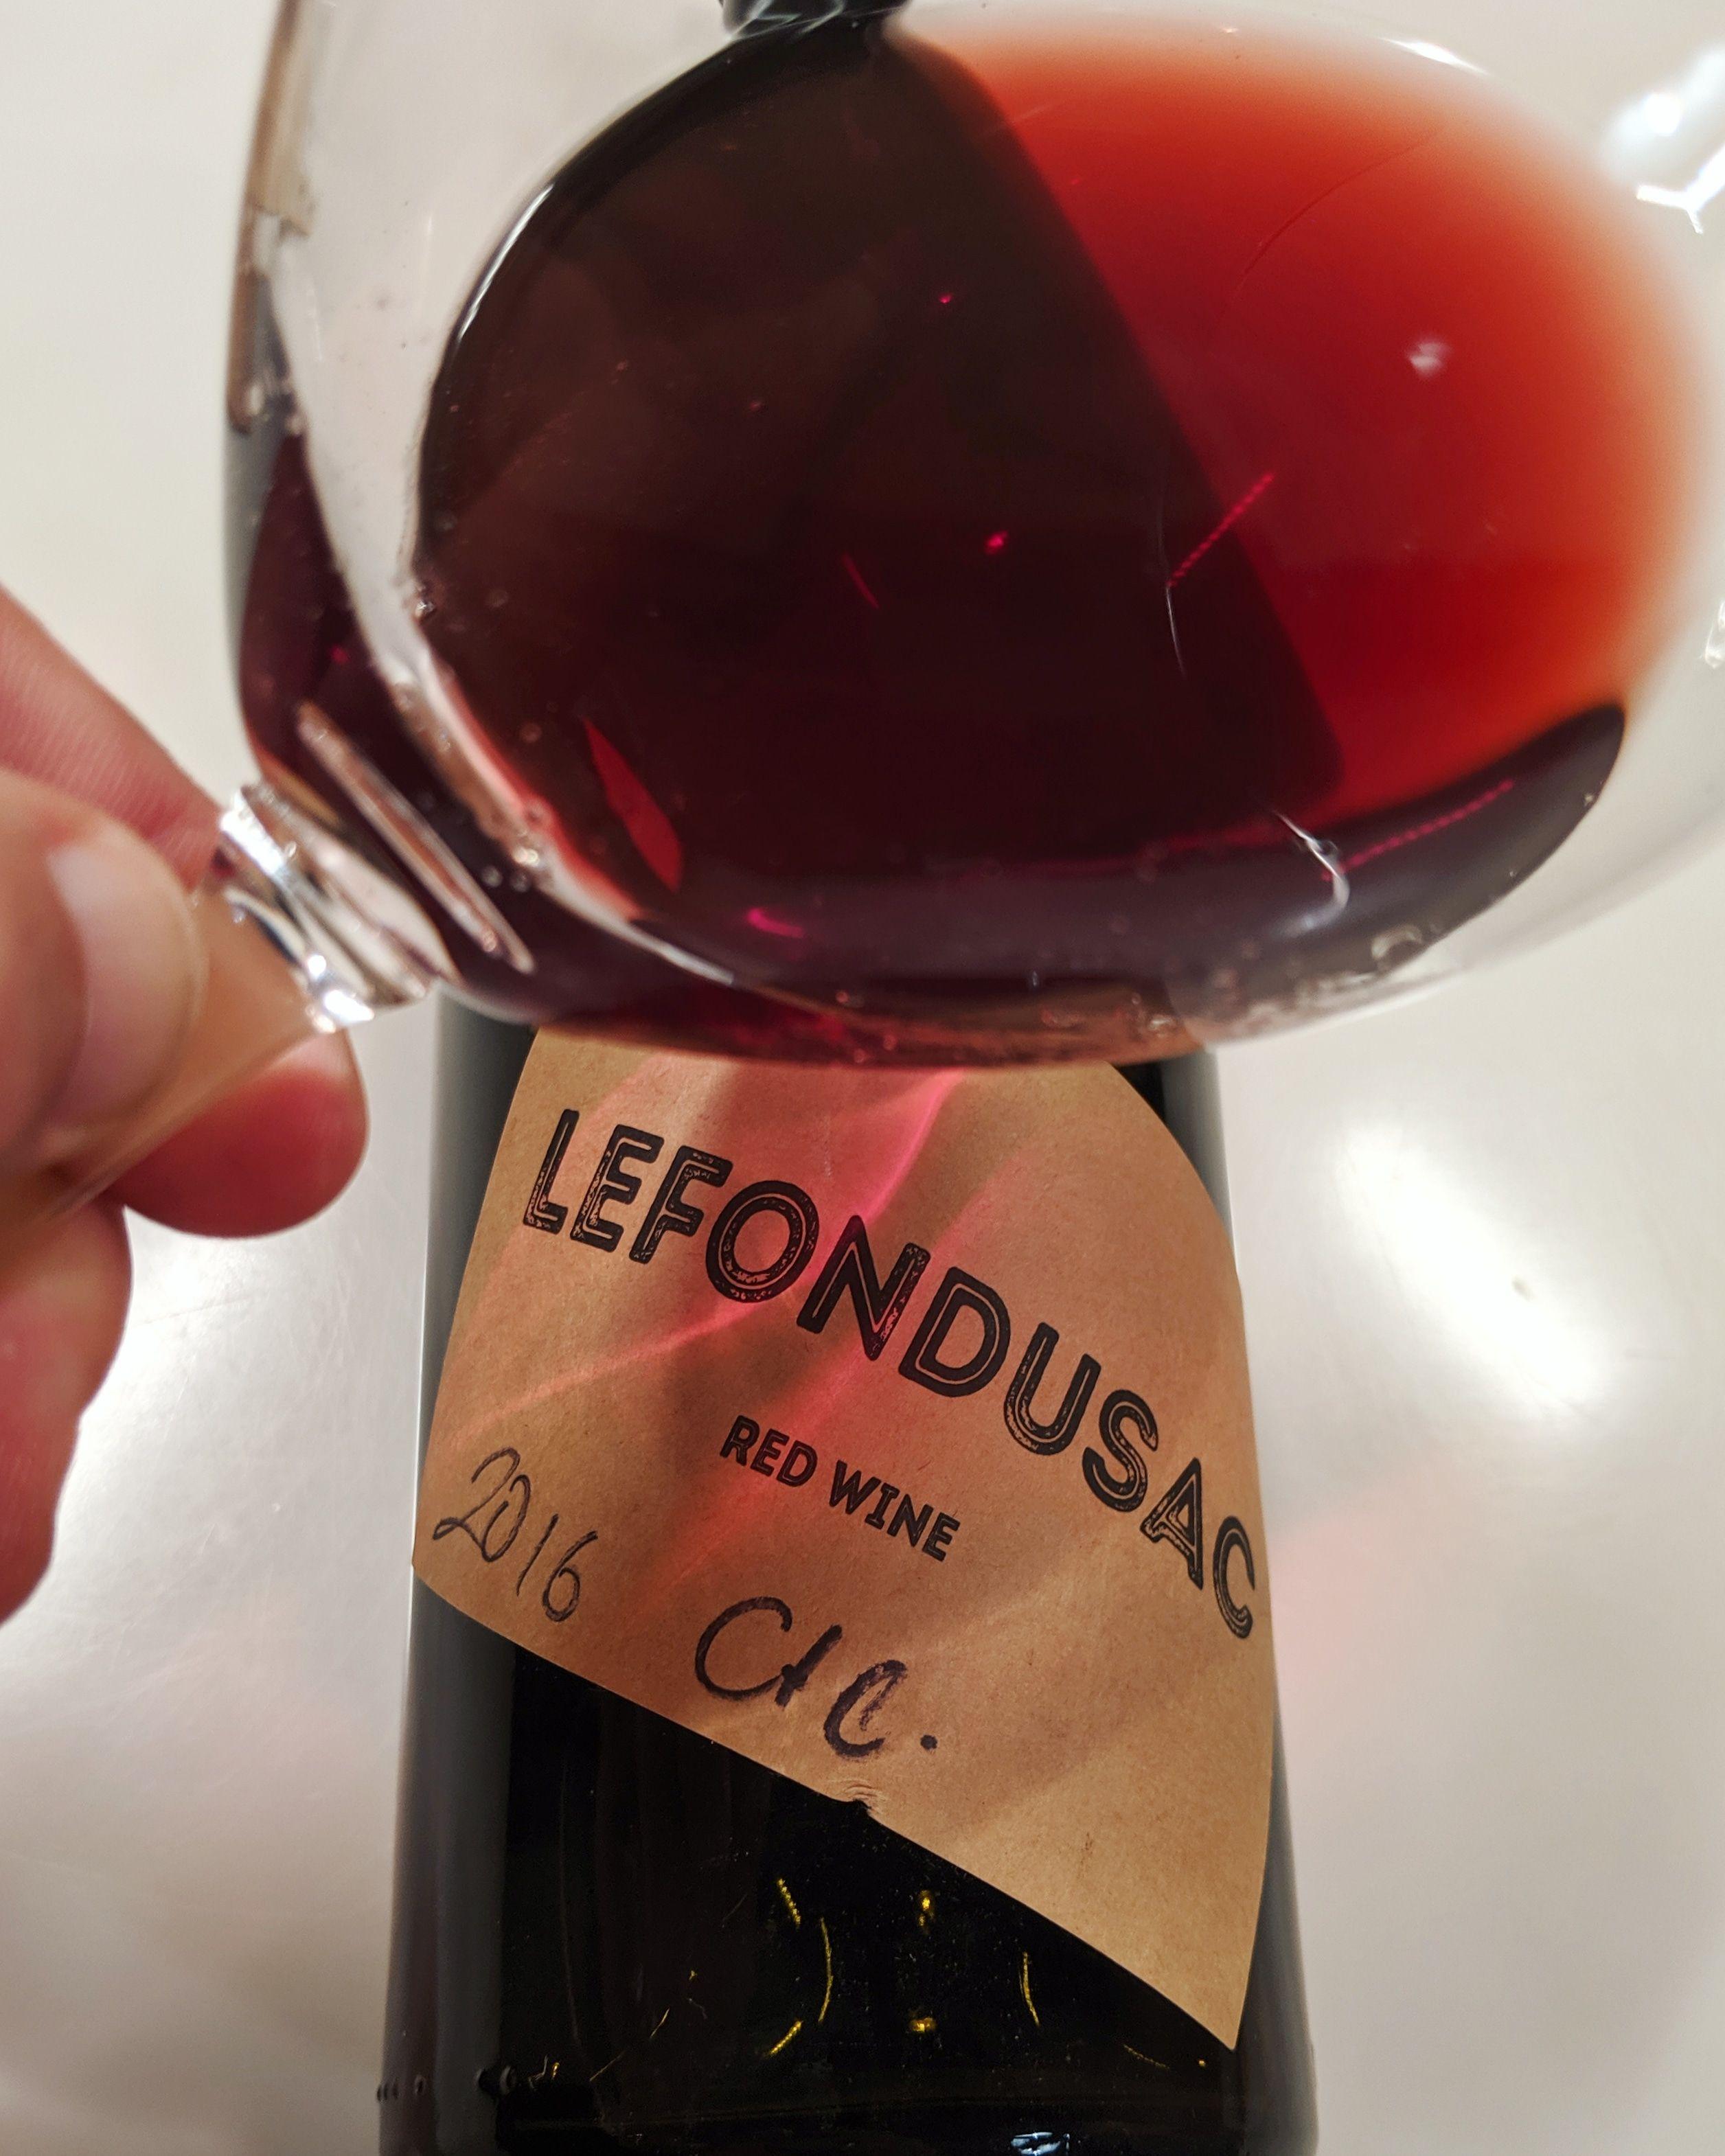 Lefondusuck Natural Wine Red Wine Wines